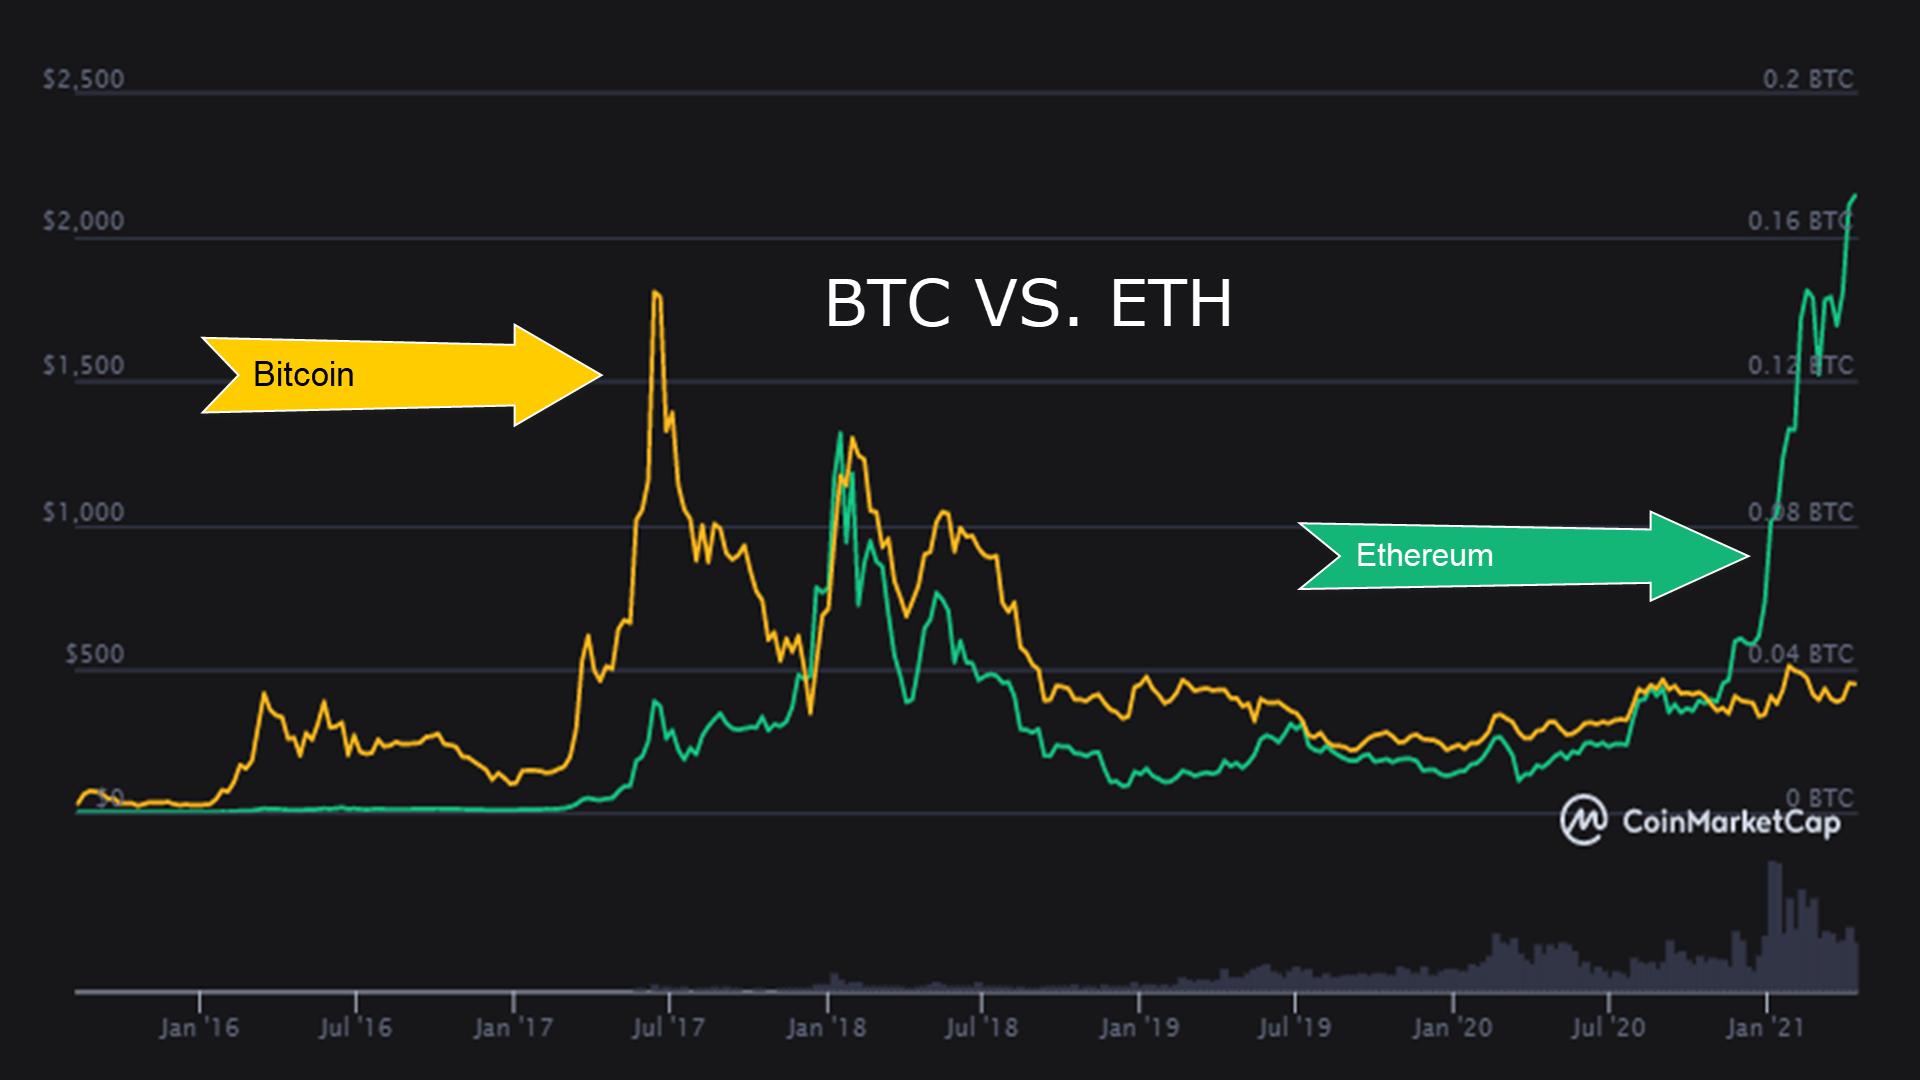 btc vs eth MONDAY CHART